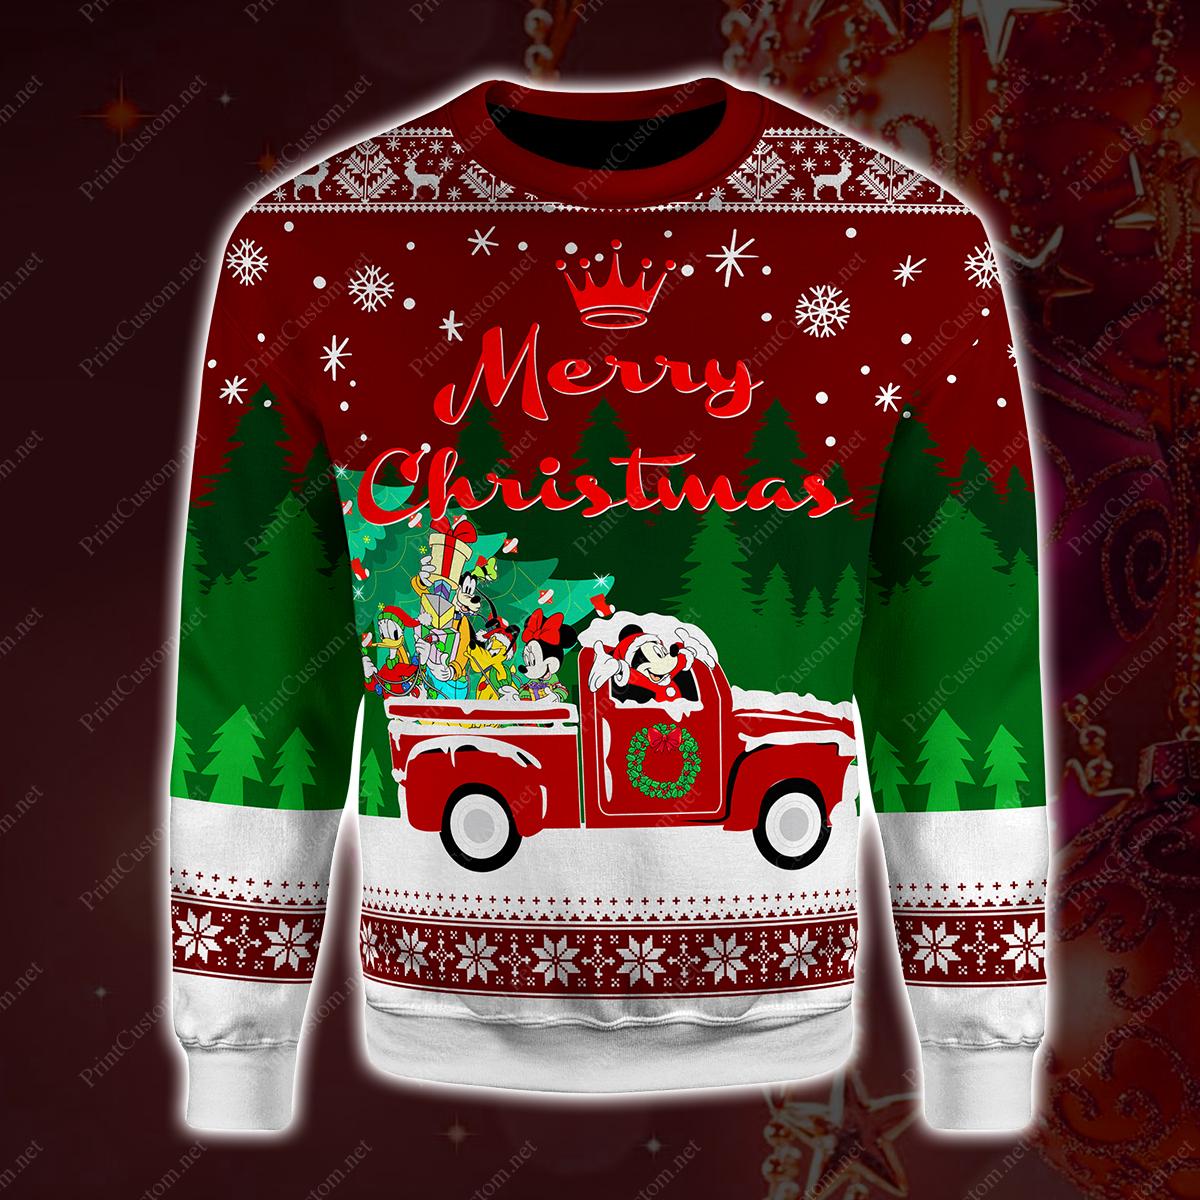 Disney characters merry christmas hallmark movies full printing shirt 2